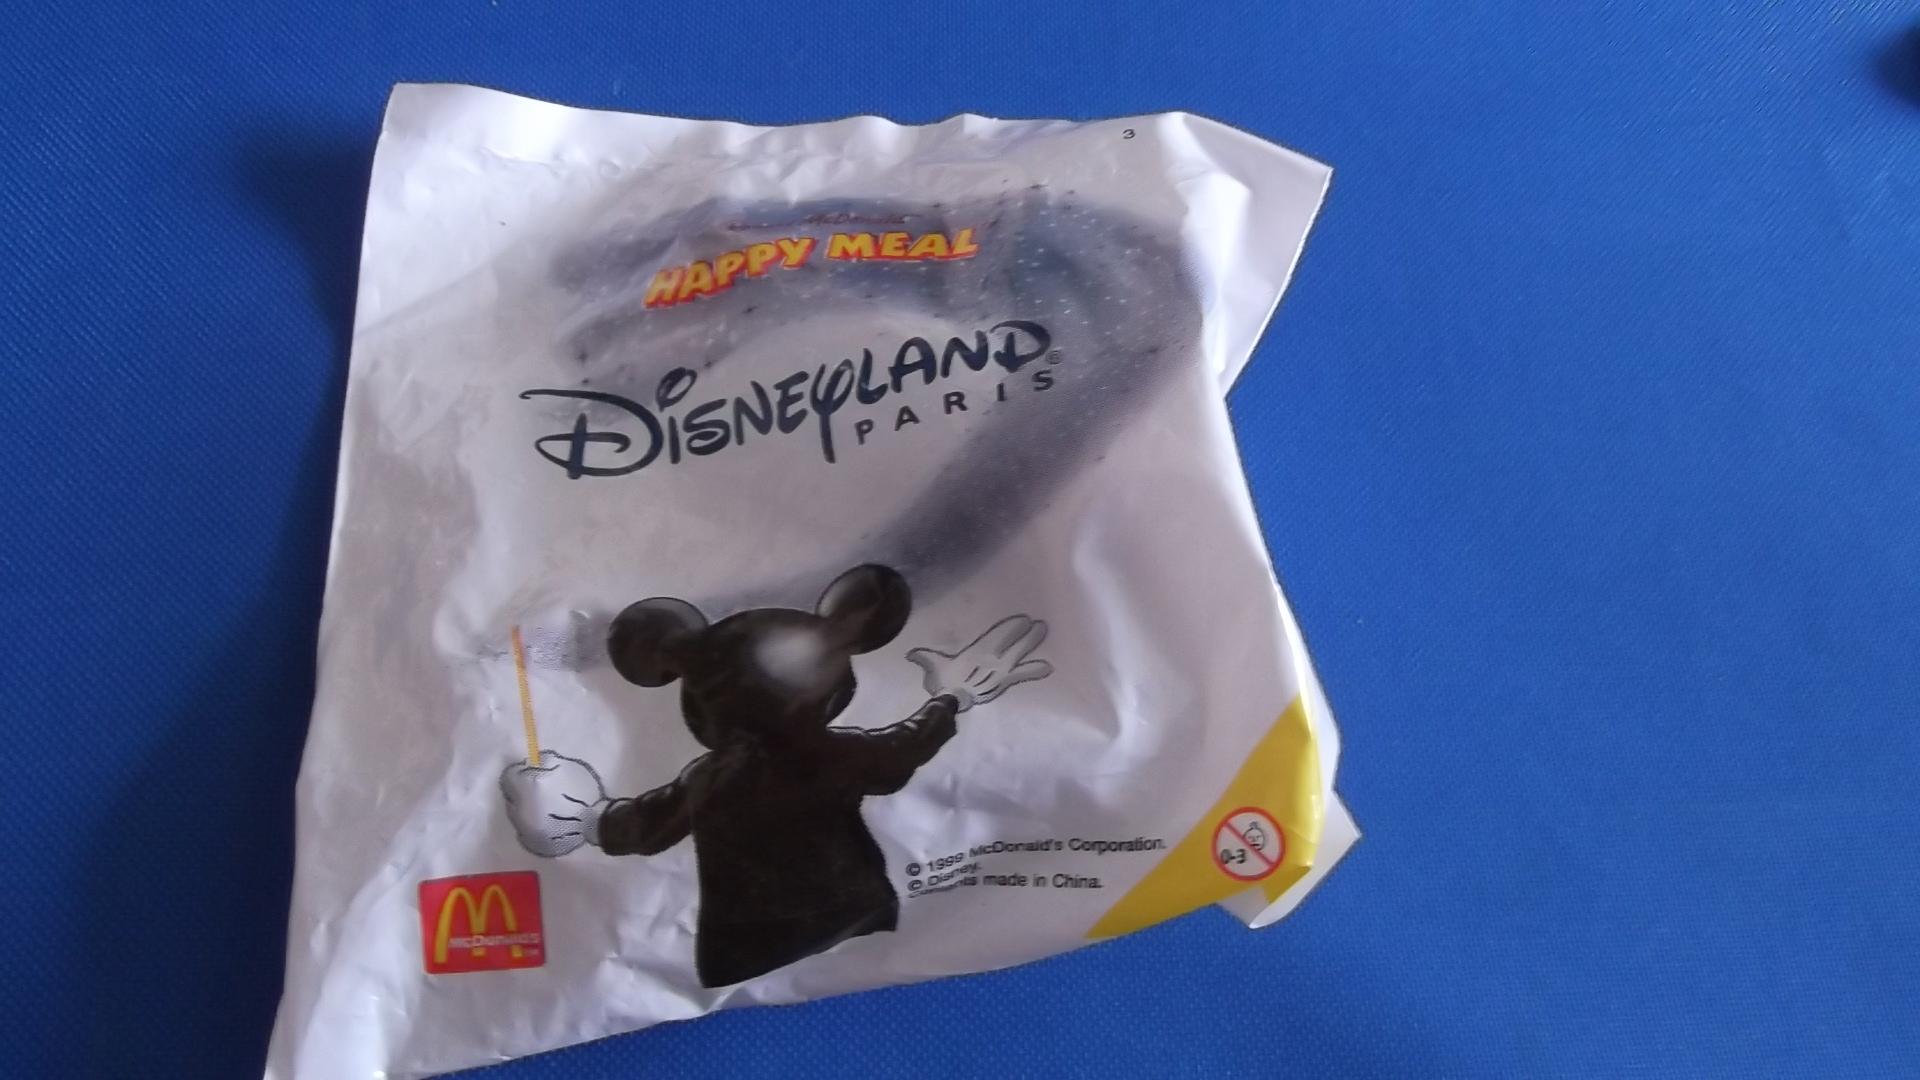 McDonalds Disneyland Paris Train #3 Toy From 1999 New